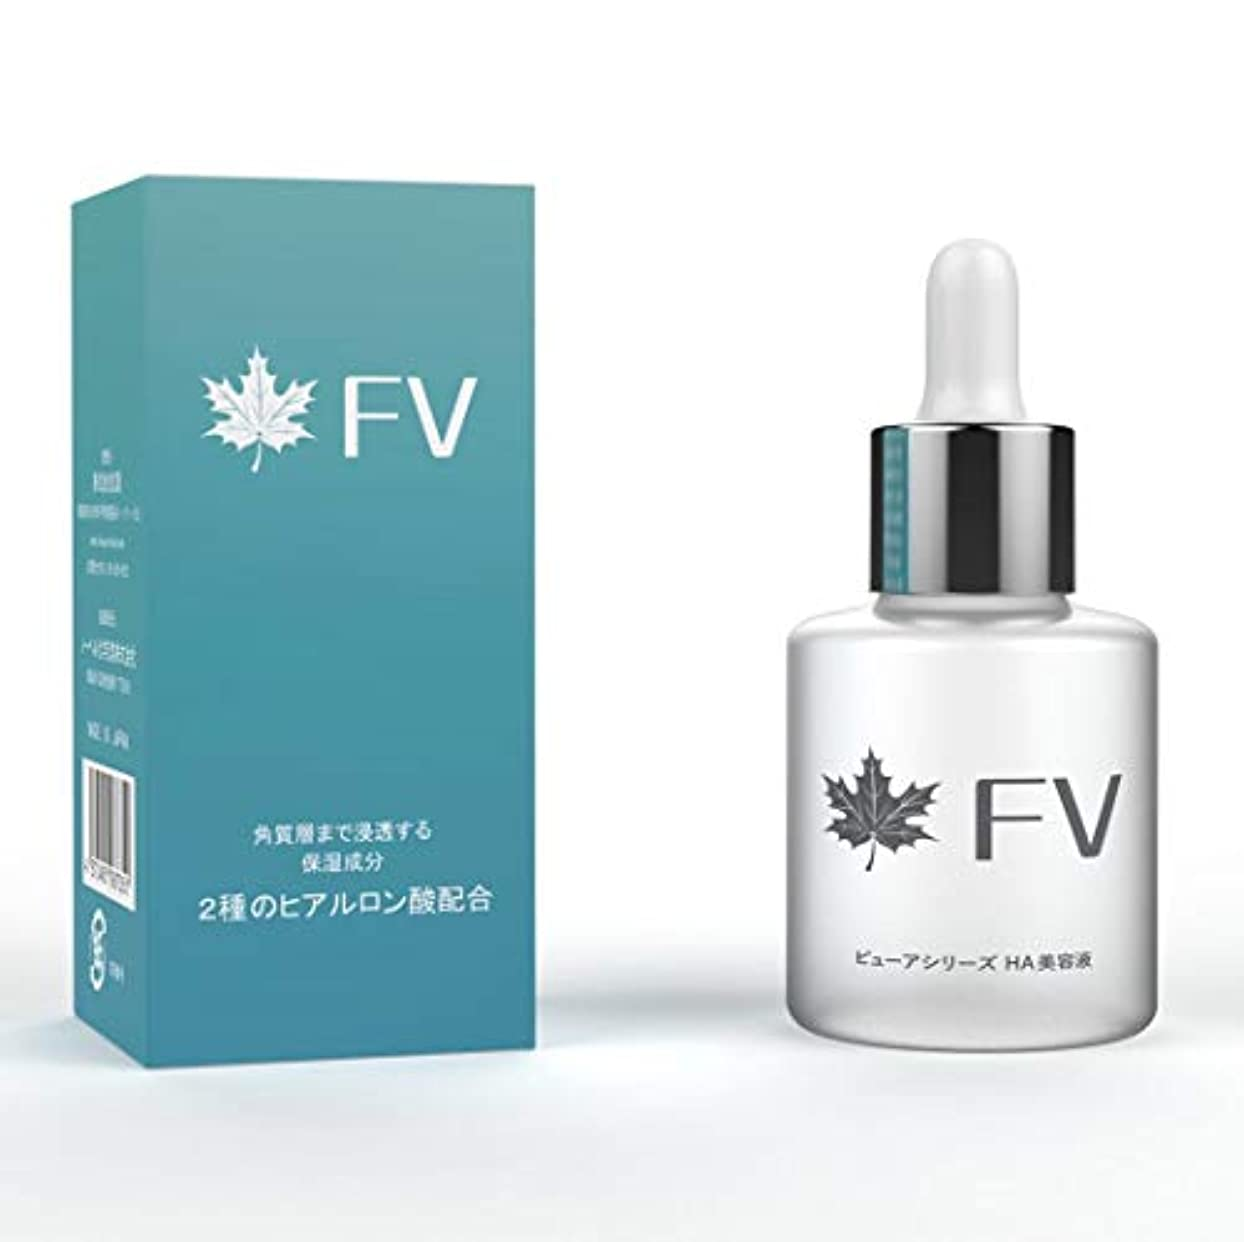 FV ヒアルロン酸原液(美容液)30ml 高分子超保湿キャッチ型と低分子修復リペア型 2種のヒアルロン酸  日本製